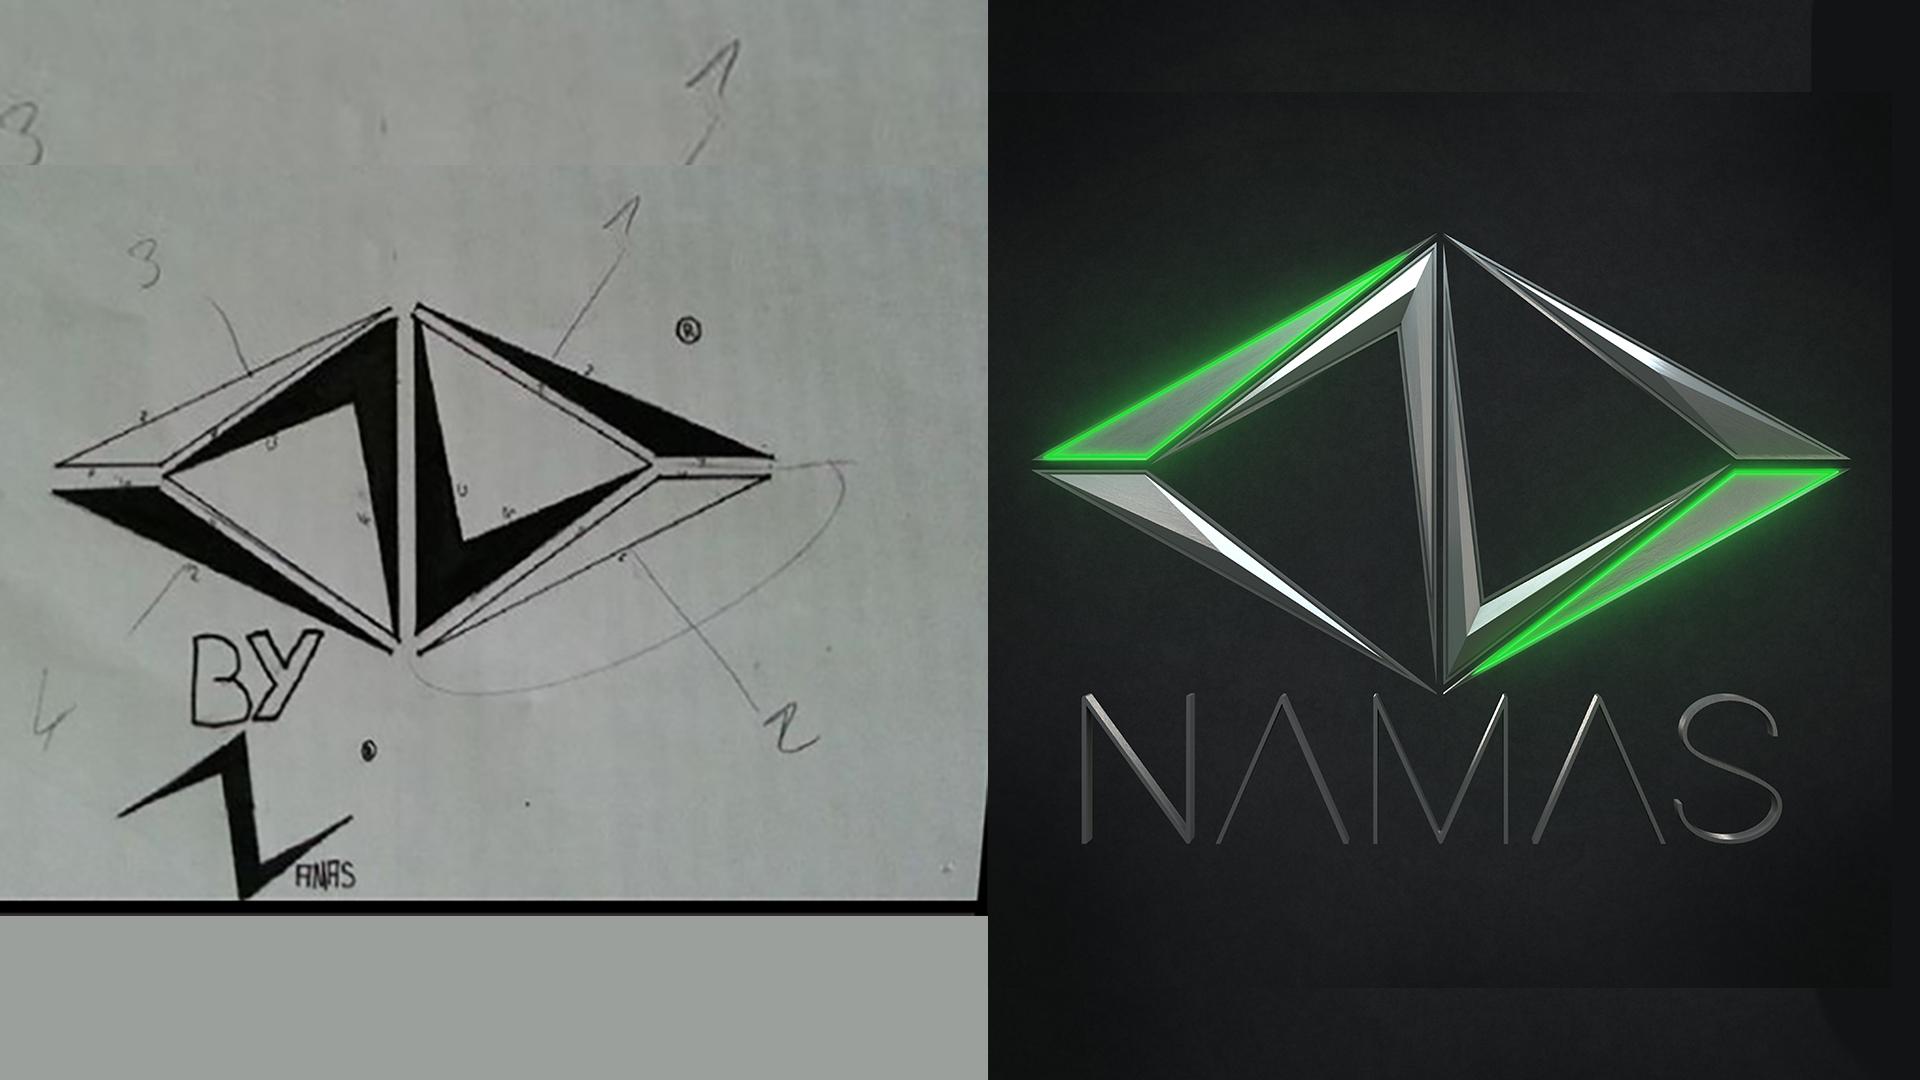 évolution logo namas 2012-2020